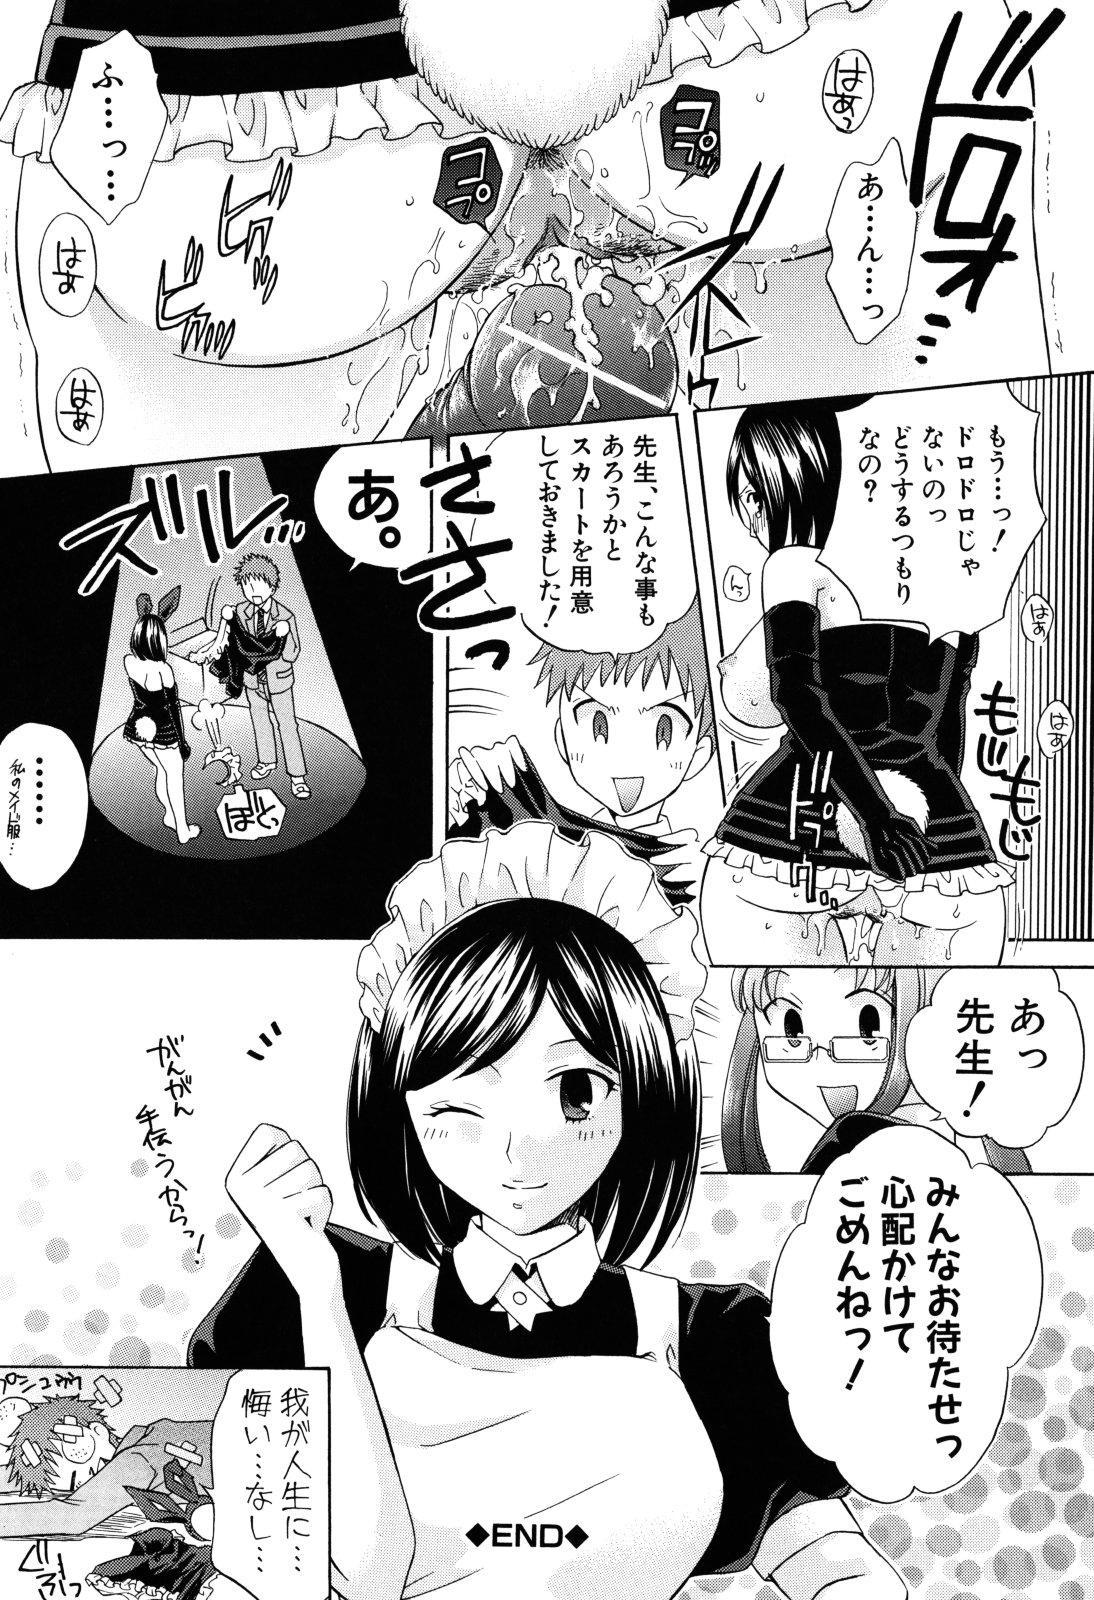 Kanojo ga Ochiru made - She in the depth 141